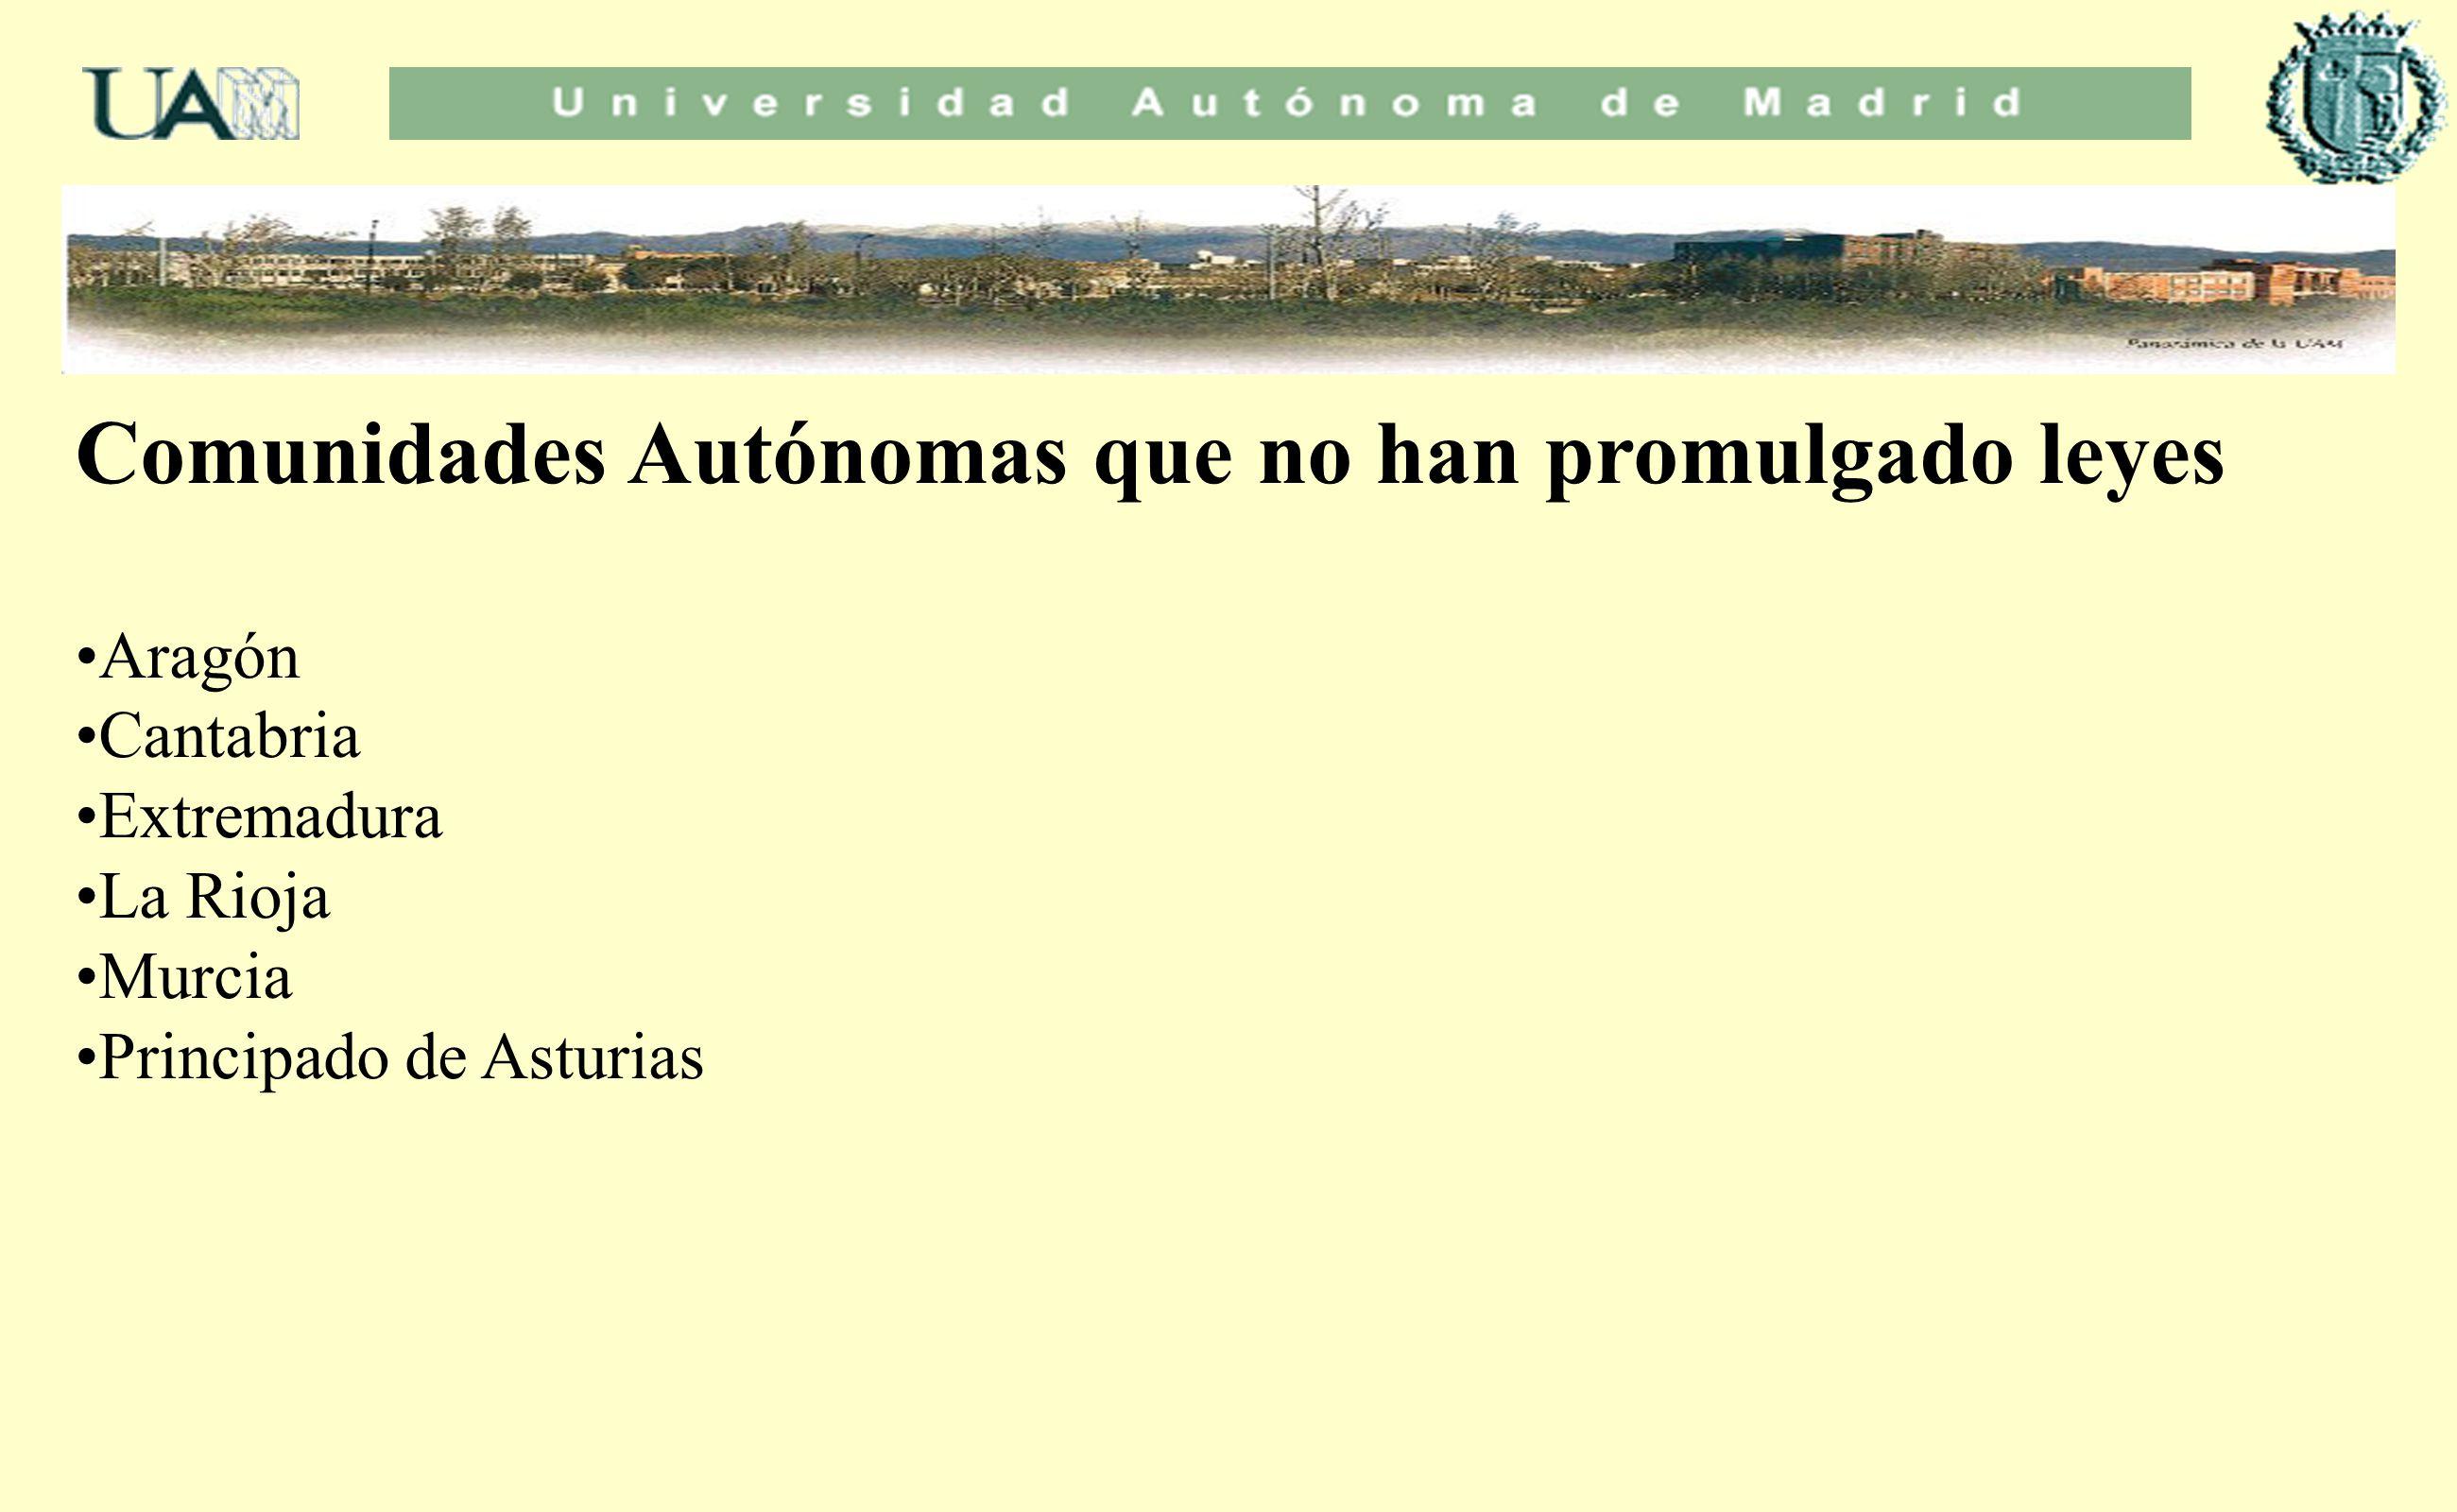 Comunidades Autónomas que no han promulgado leyes Aragón Cantabria Extremadura La Rioja Murcia Principado de Asturias